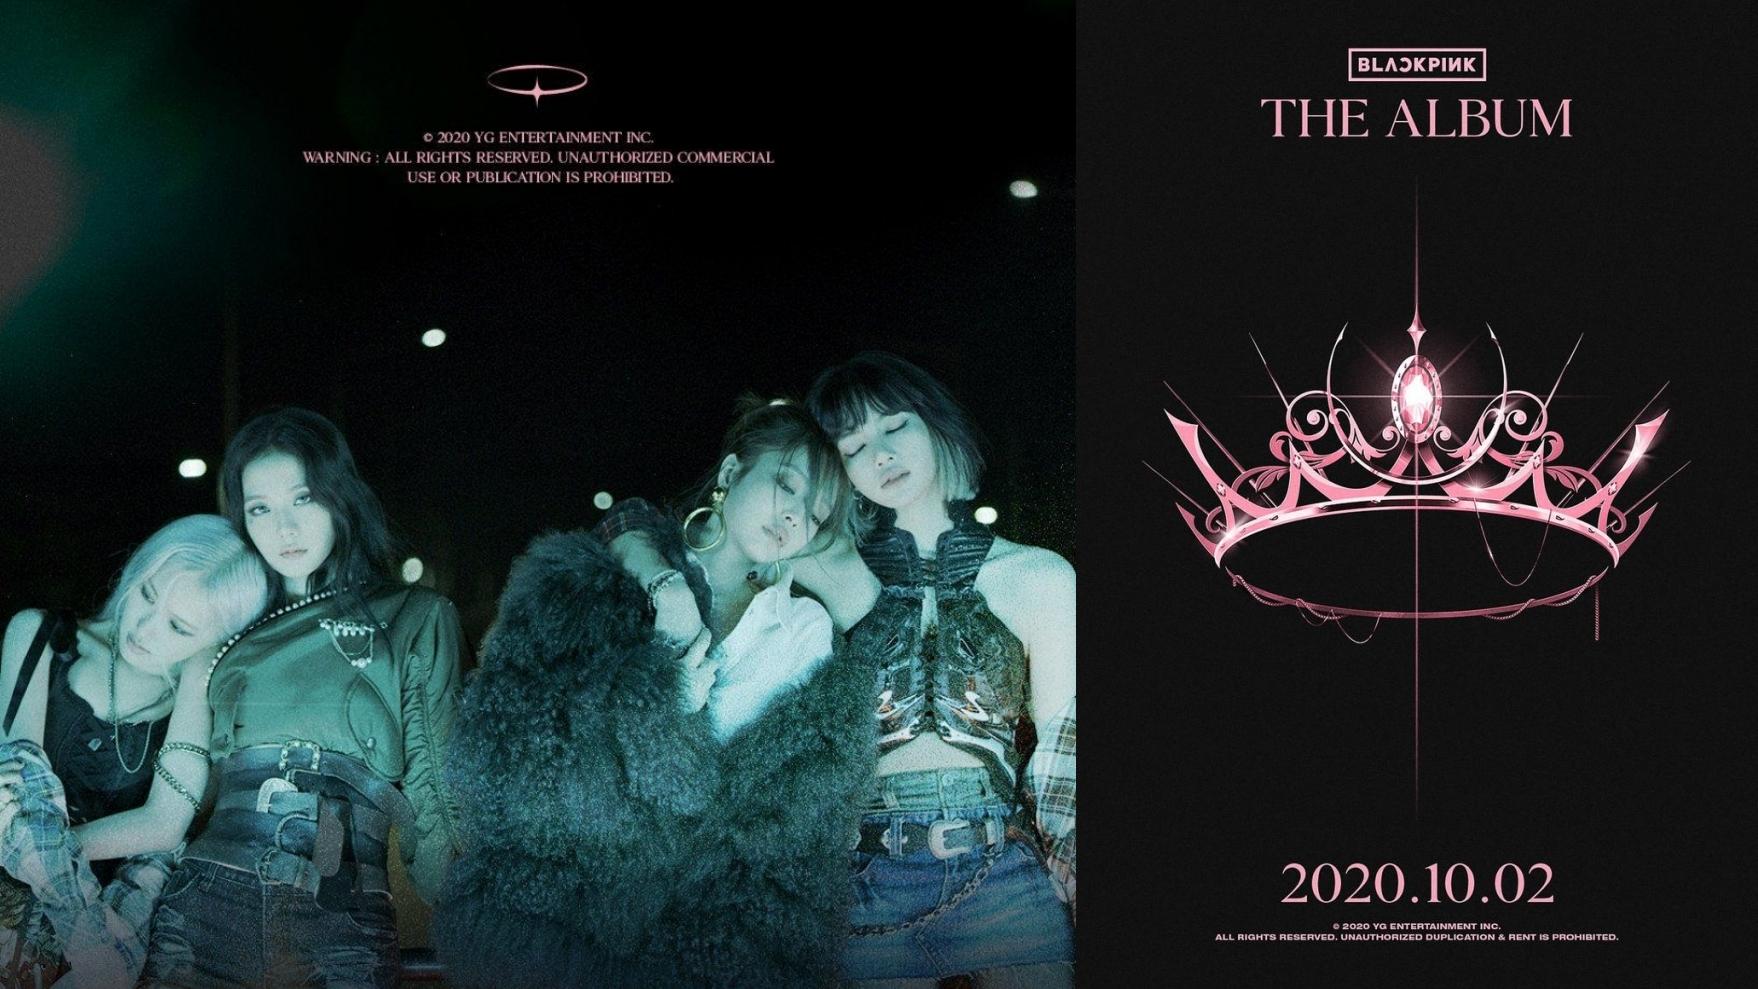 BLACKPINK Breaks IZ*ONE's Record, 'THE ALBUM' Becomes the Best-Selling K-Pop Girl Group Album